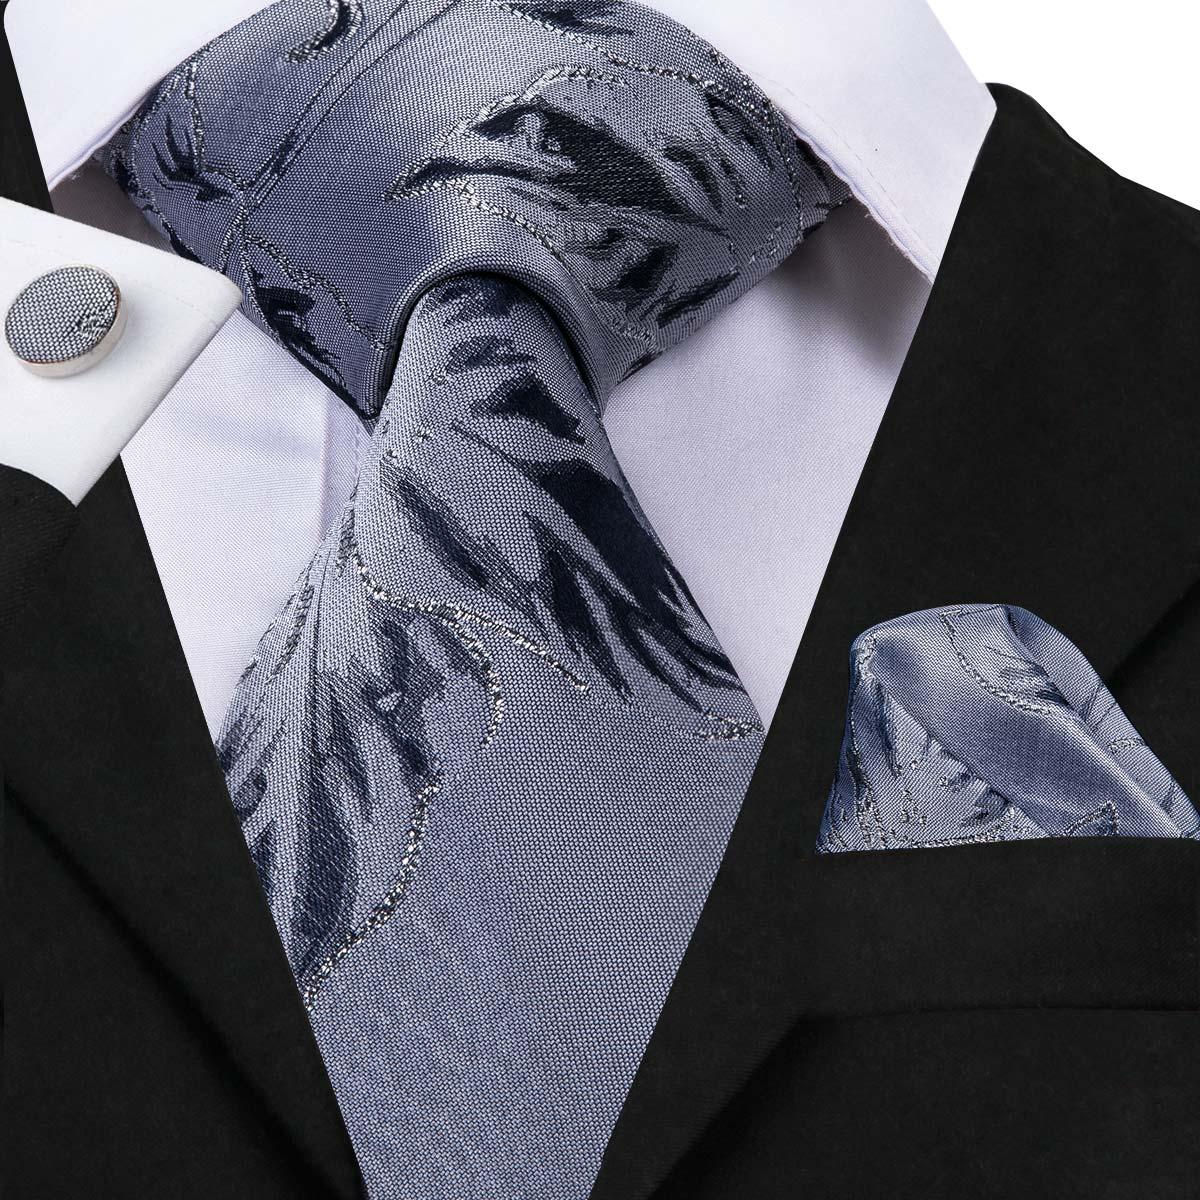 Hi-Tie Hot Sale Top Quality Ties Gravatas Skinny Neck Ties For Men New Fashion Styles Neckties Hanky Cufflinks Set C-3060